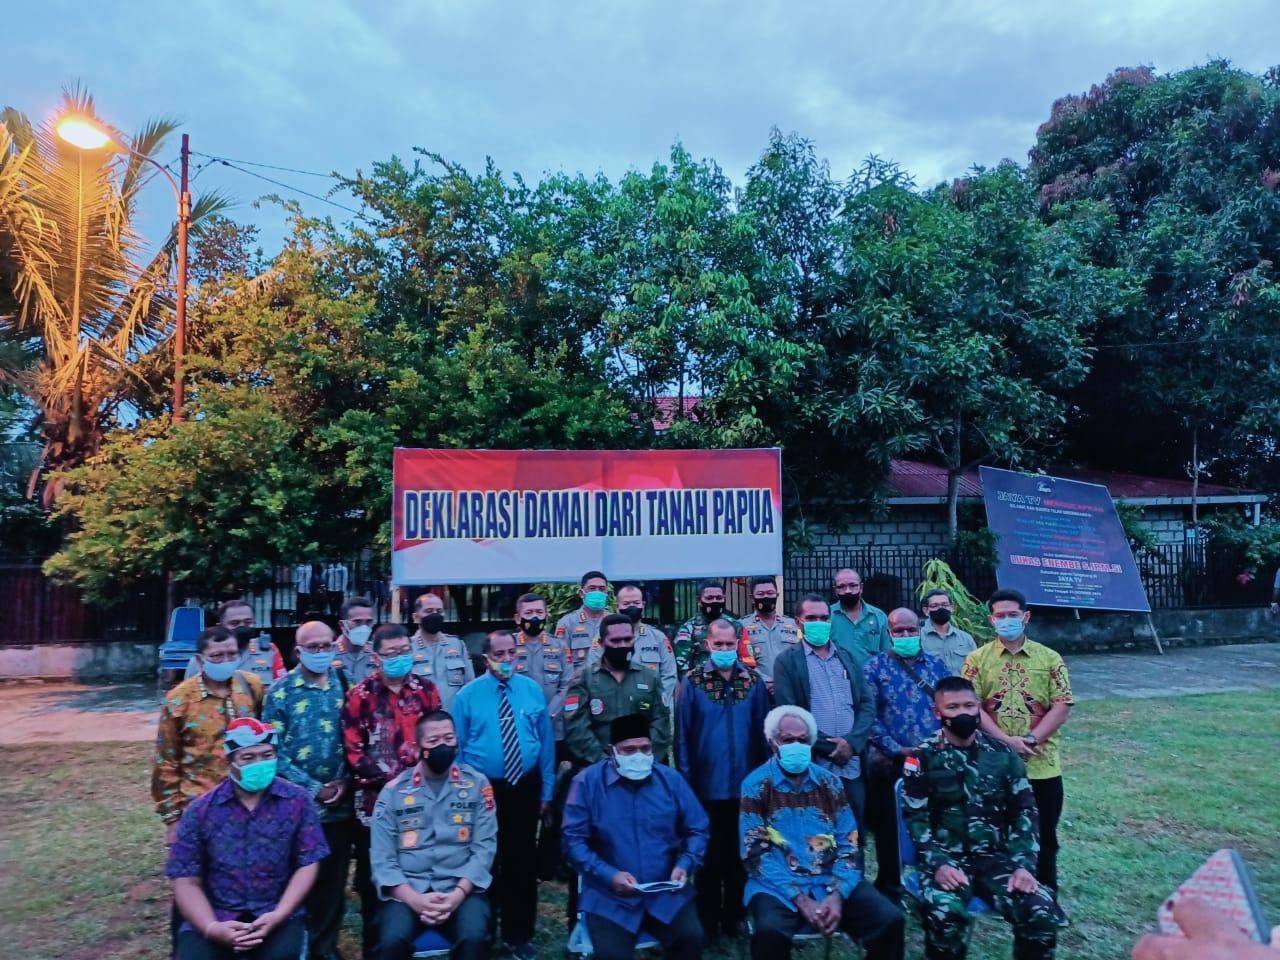 Deklarasi Damai, FKUB Bersama Seluruh Komponen di Papua Kutuk Keras Aksi Terorisme